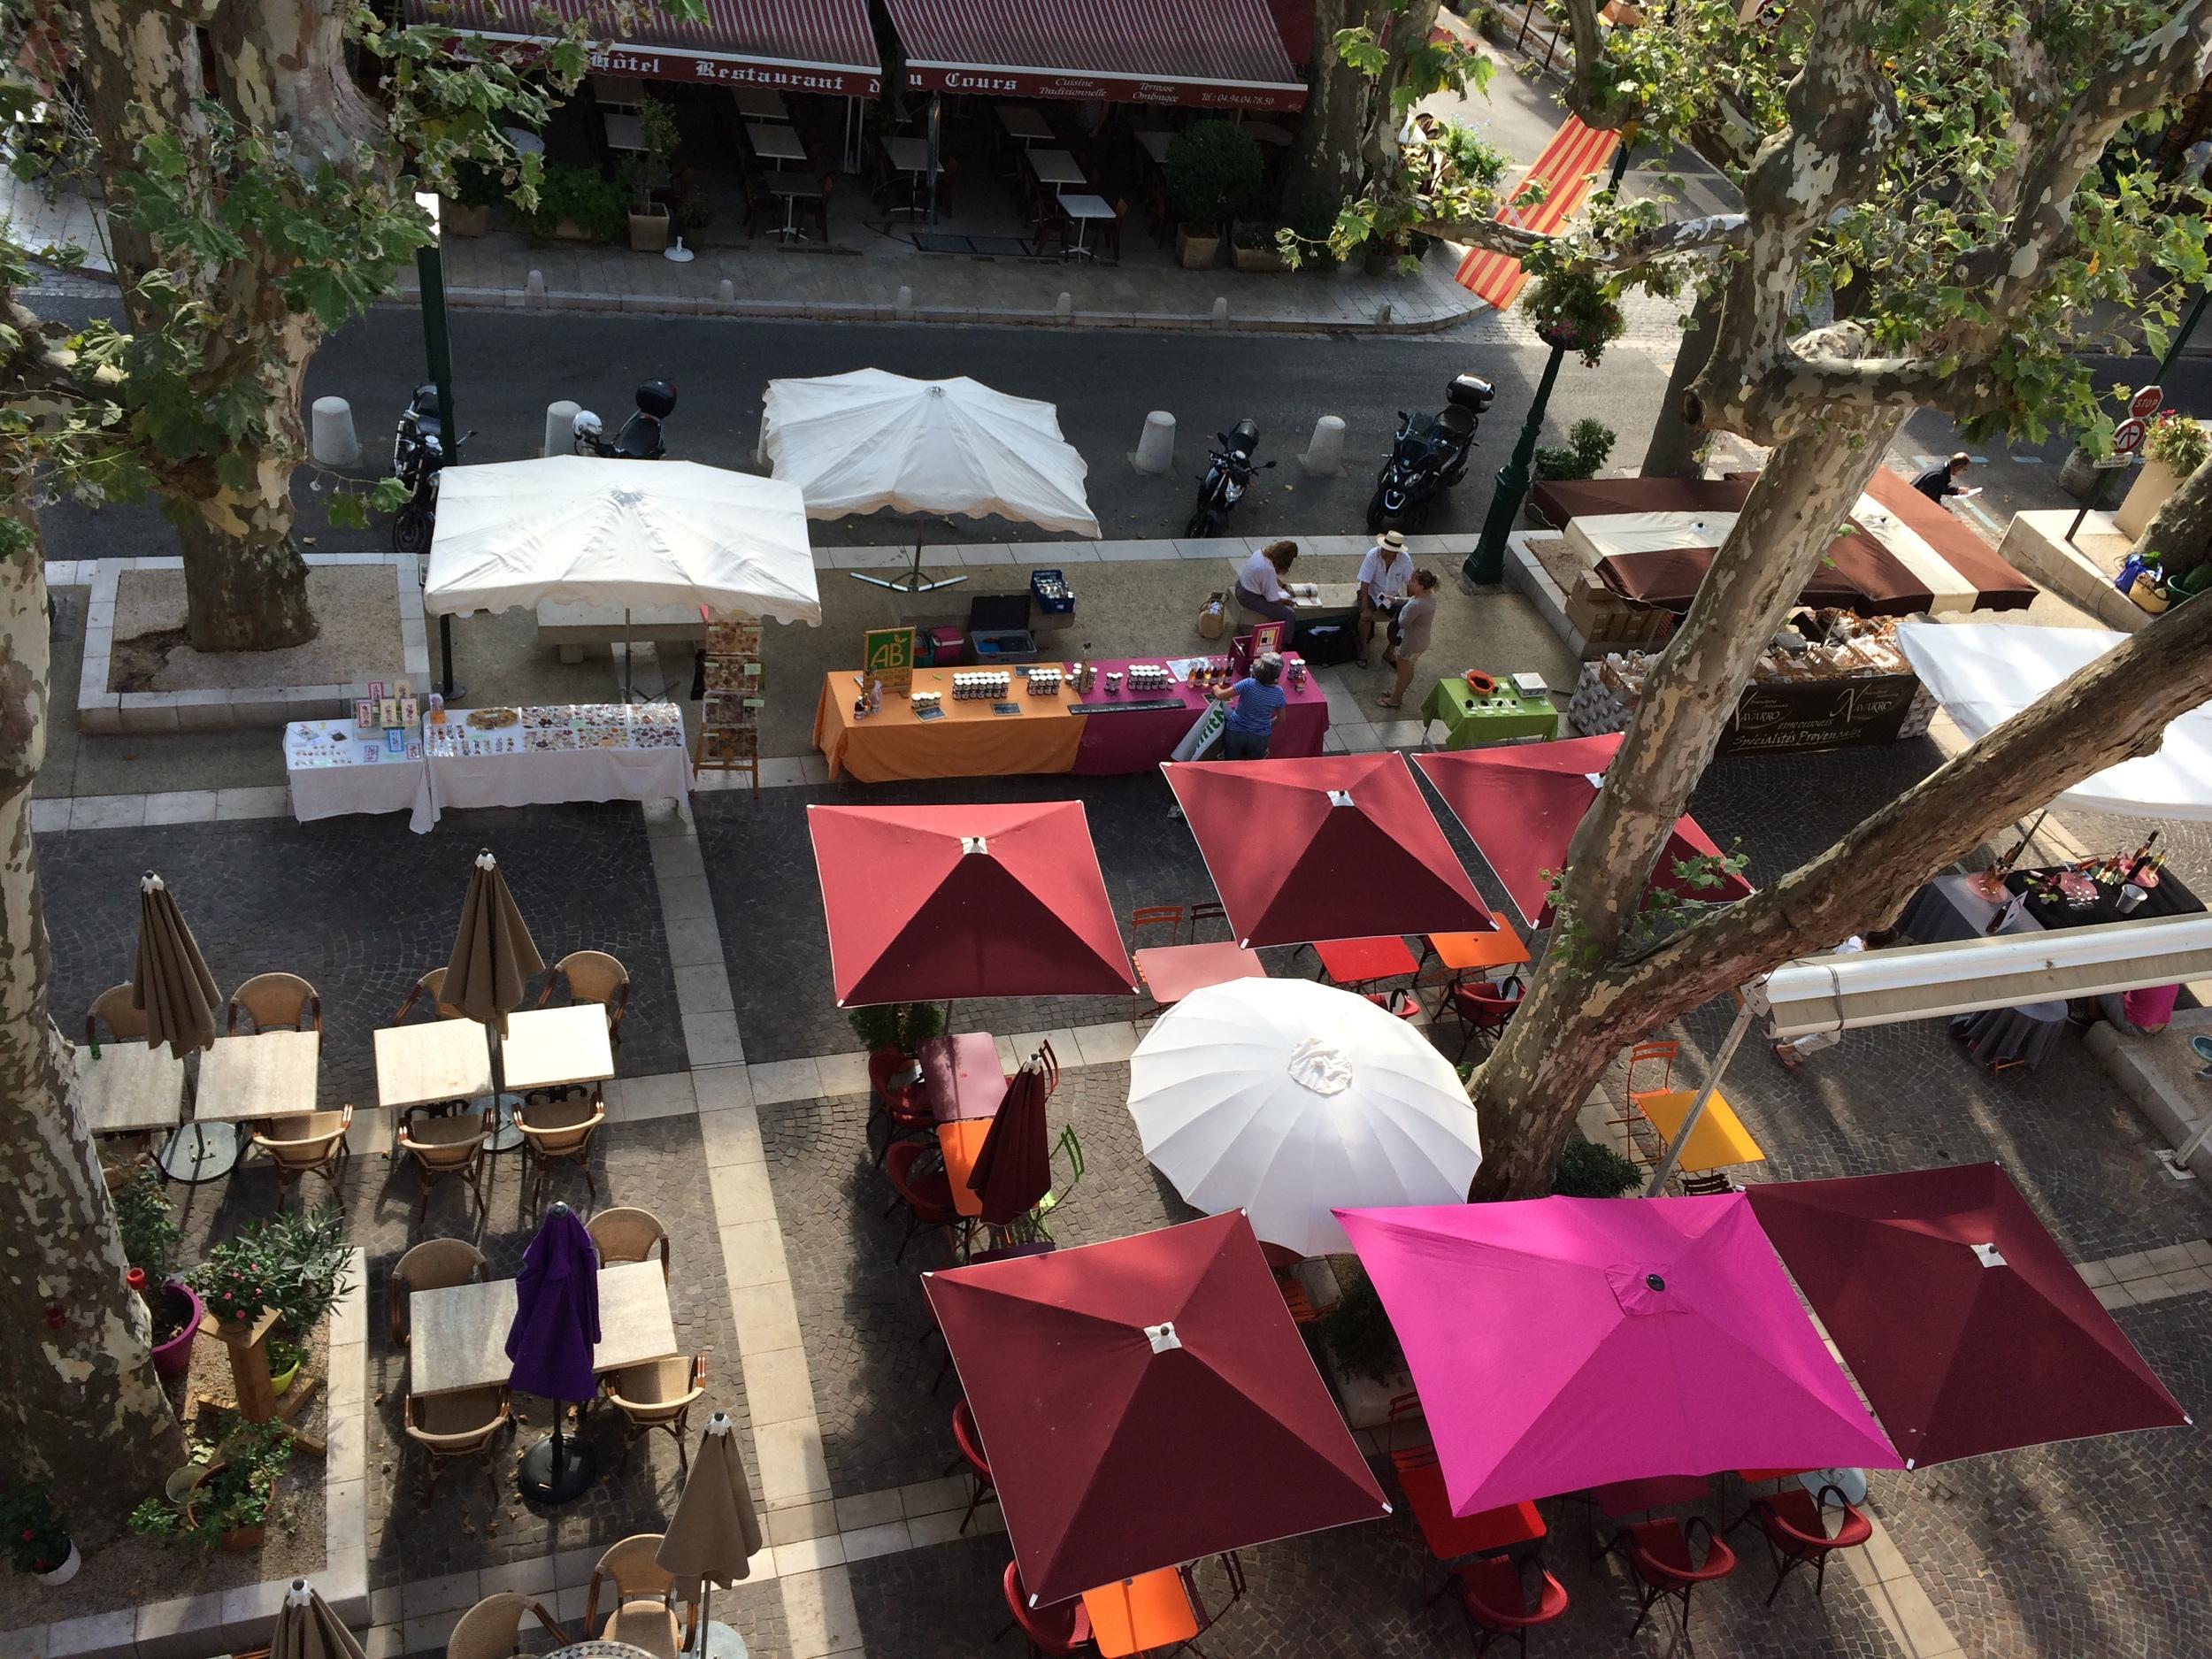 Artisan Market - from my window